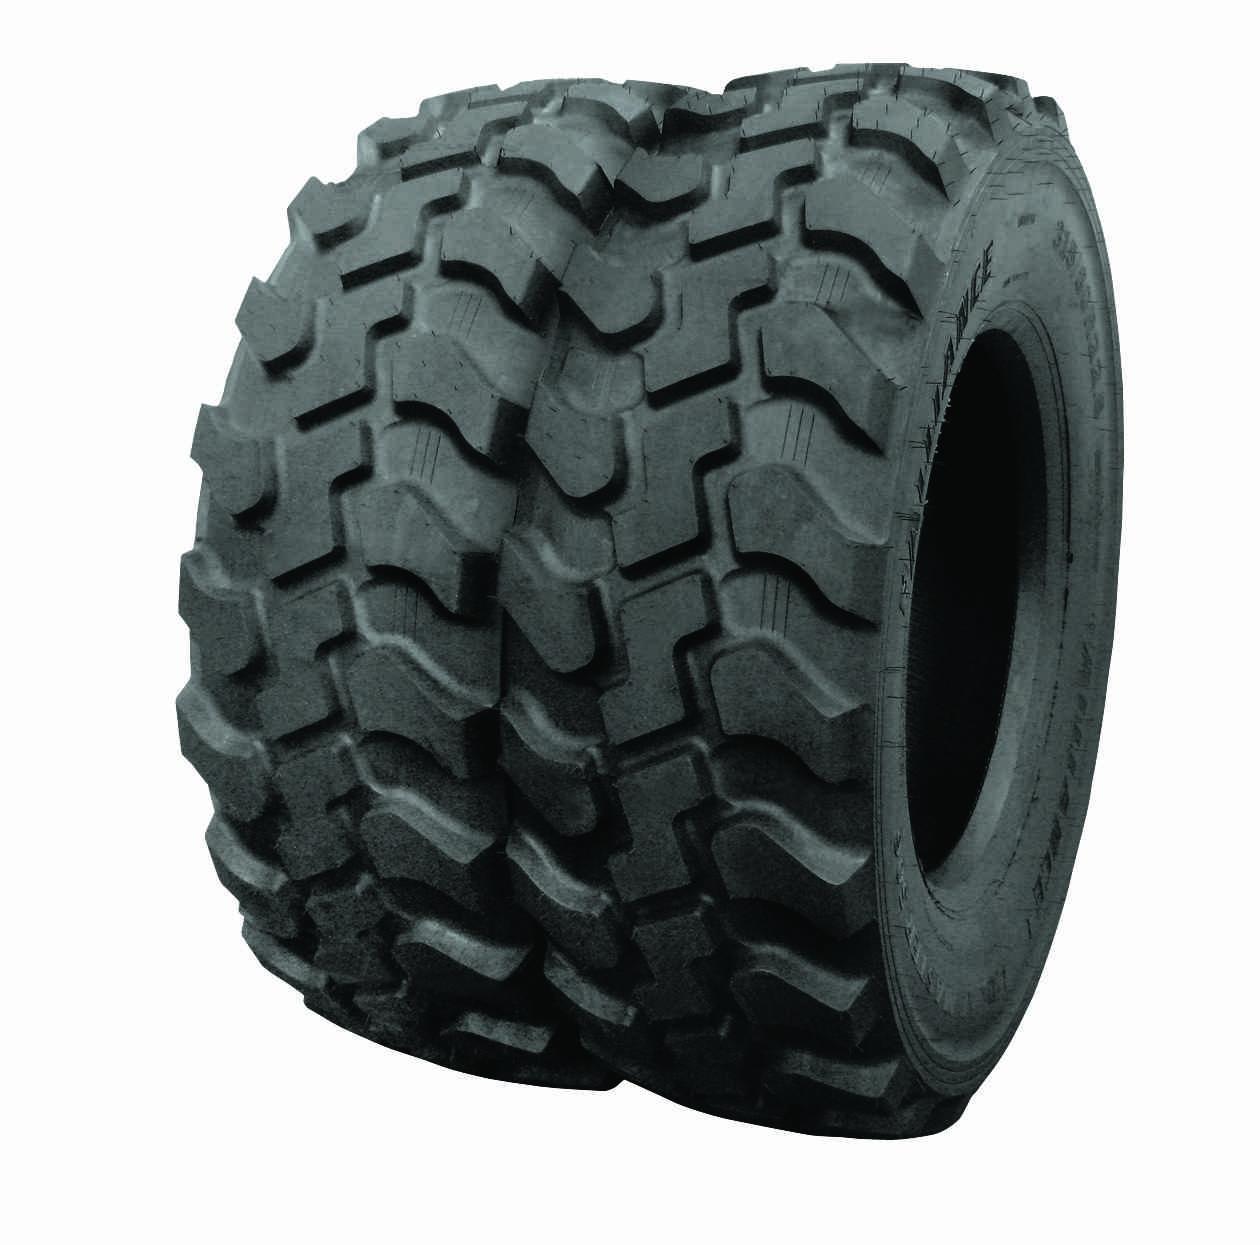 Alliance Tire Shows High Flotation Dually Like Tires New